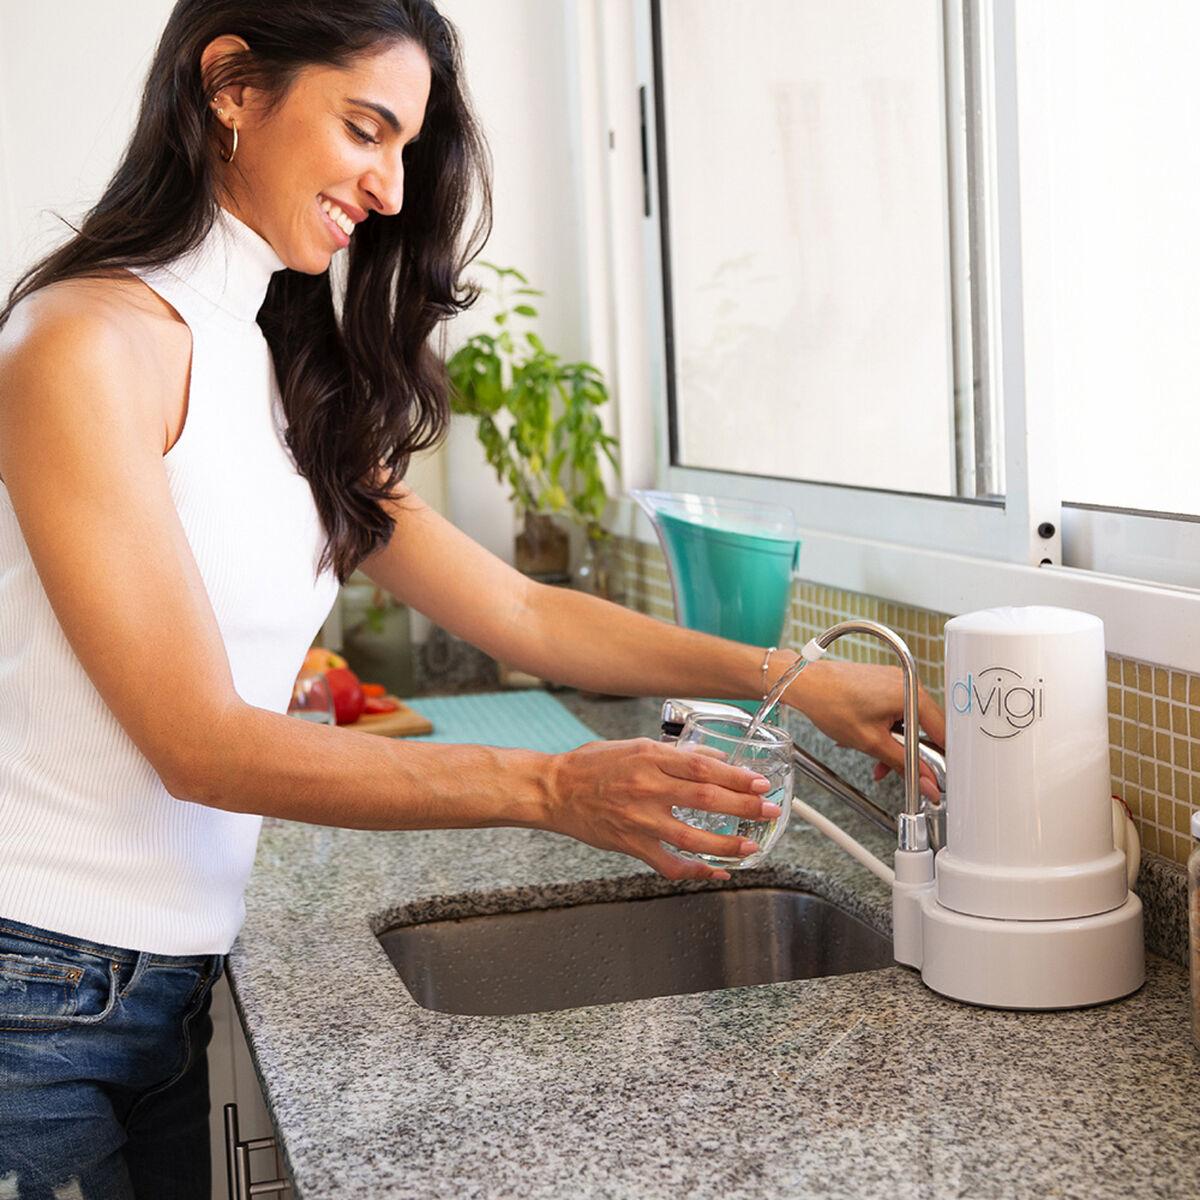 Purificador de Agua Mini Dvigi Sobre Cubierta Blanco